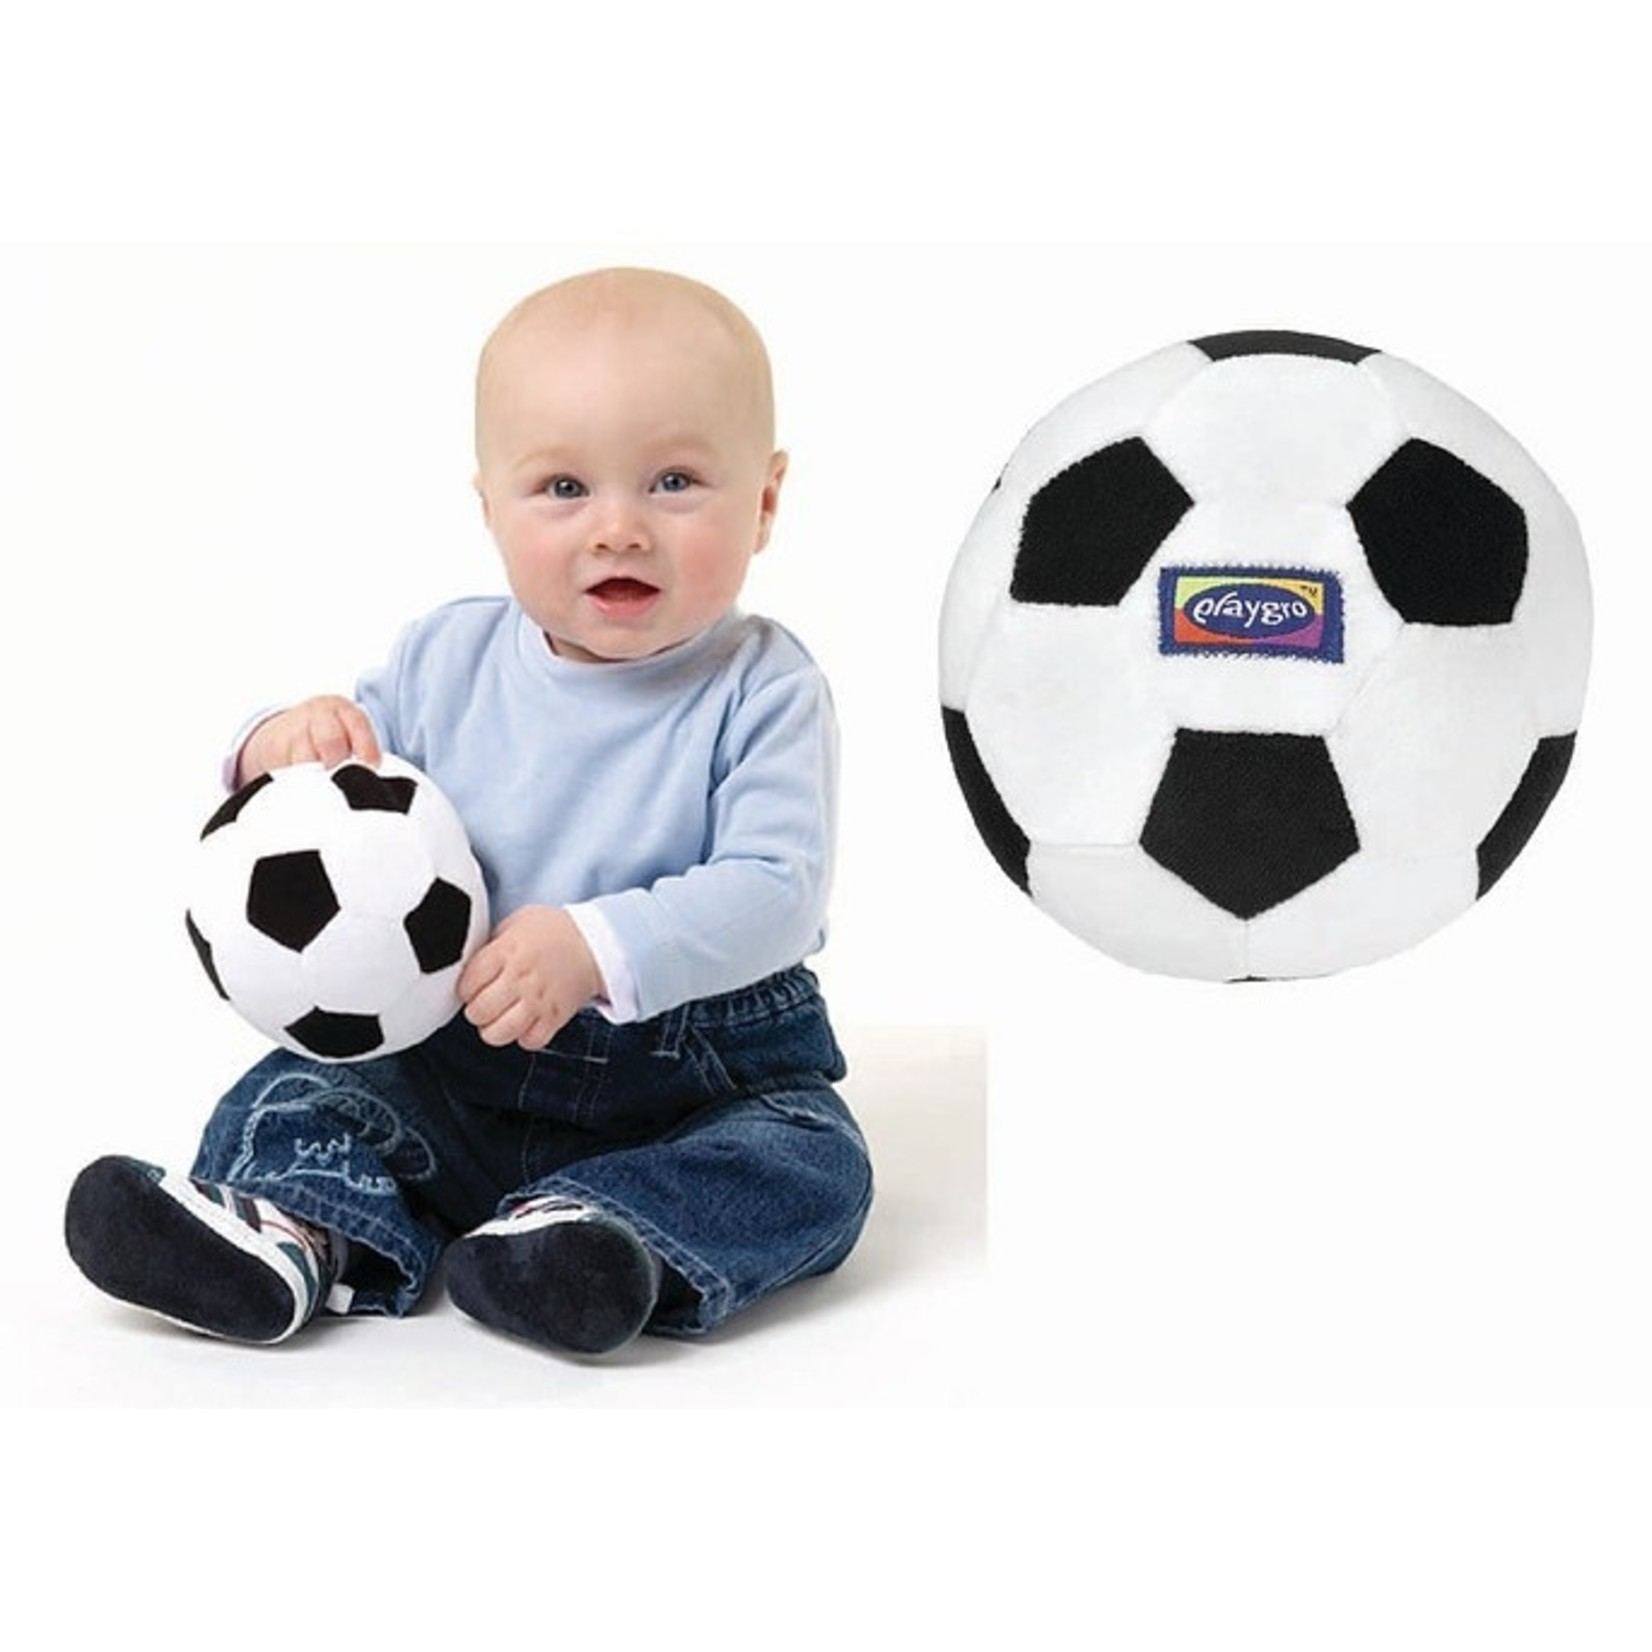 Playgro Playgro My first Soccer Ball